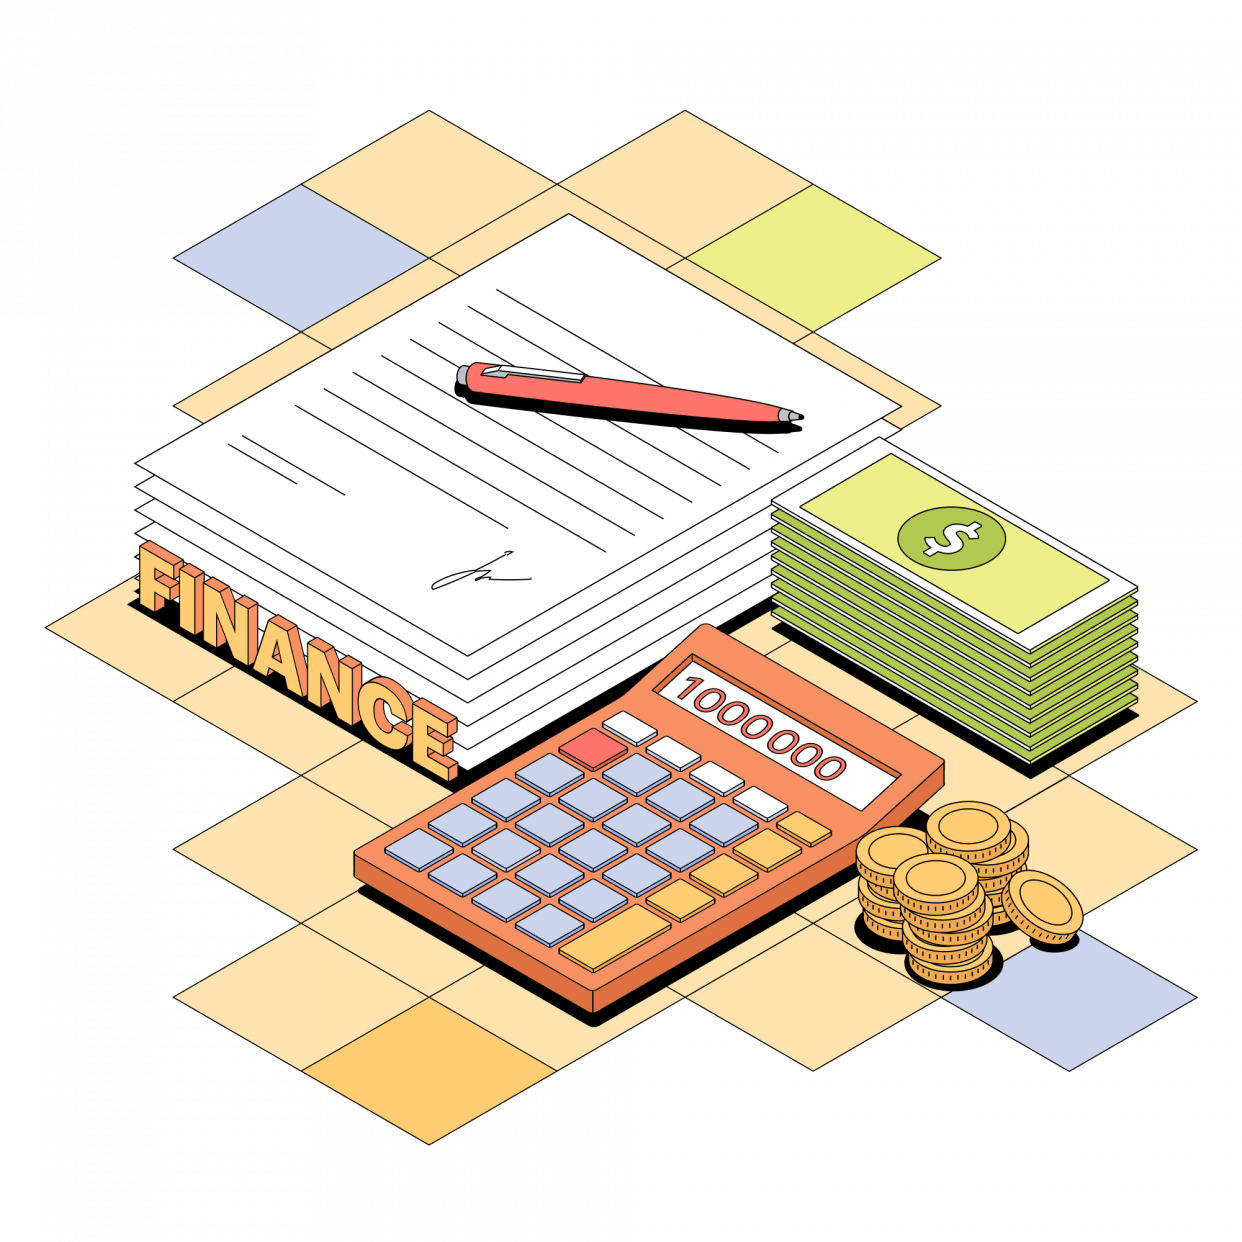 Курс «Экономист-финансист» от Skillbox